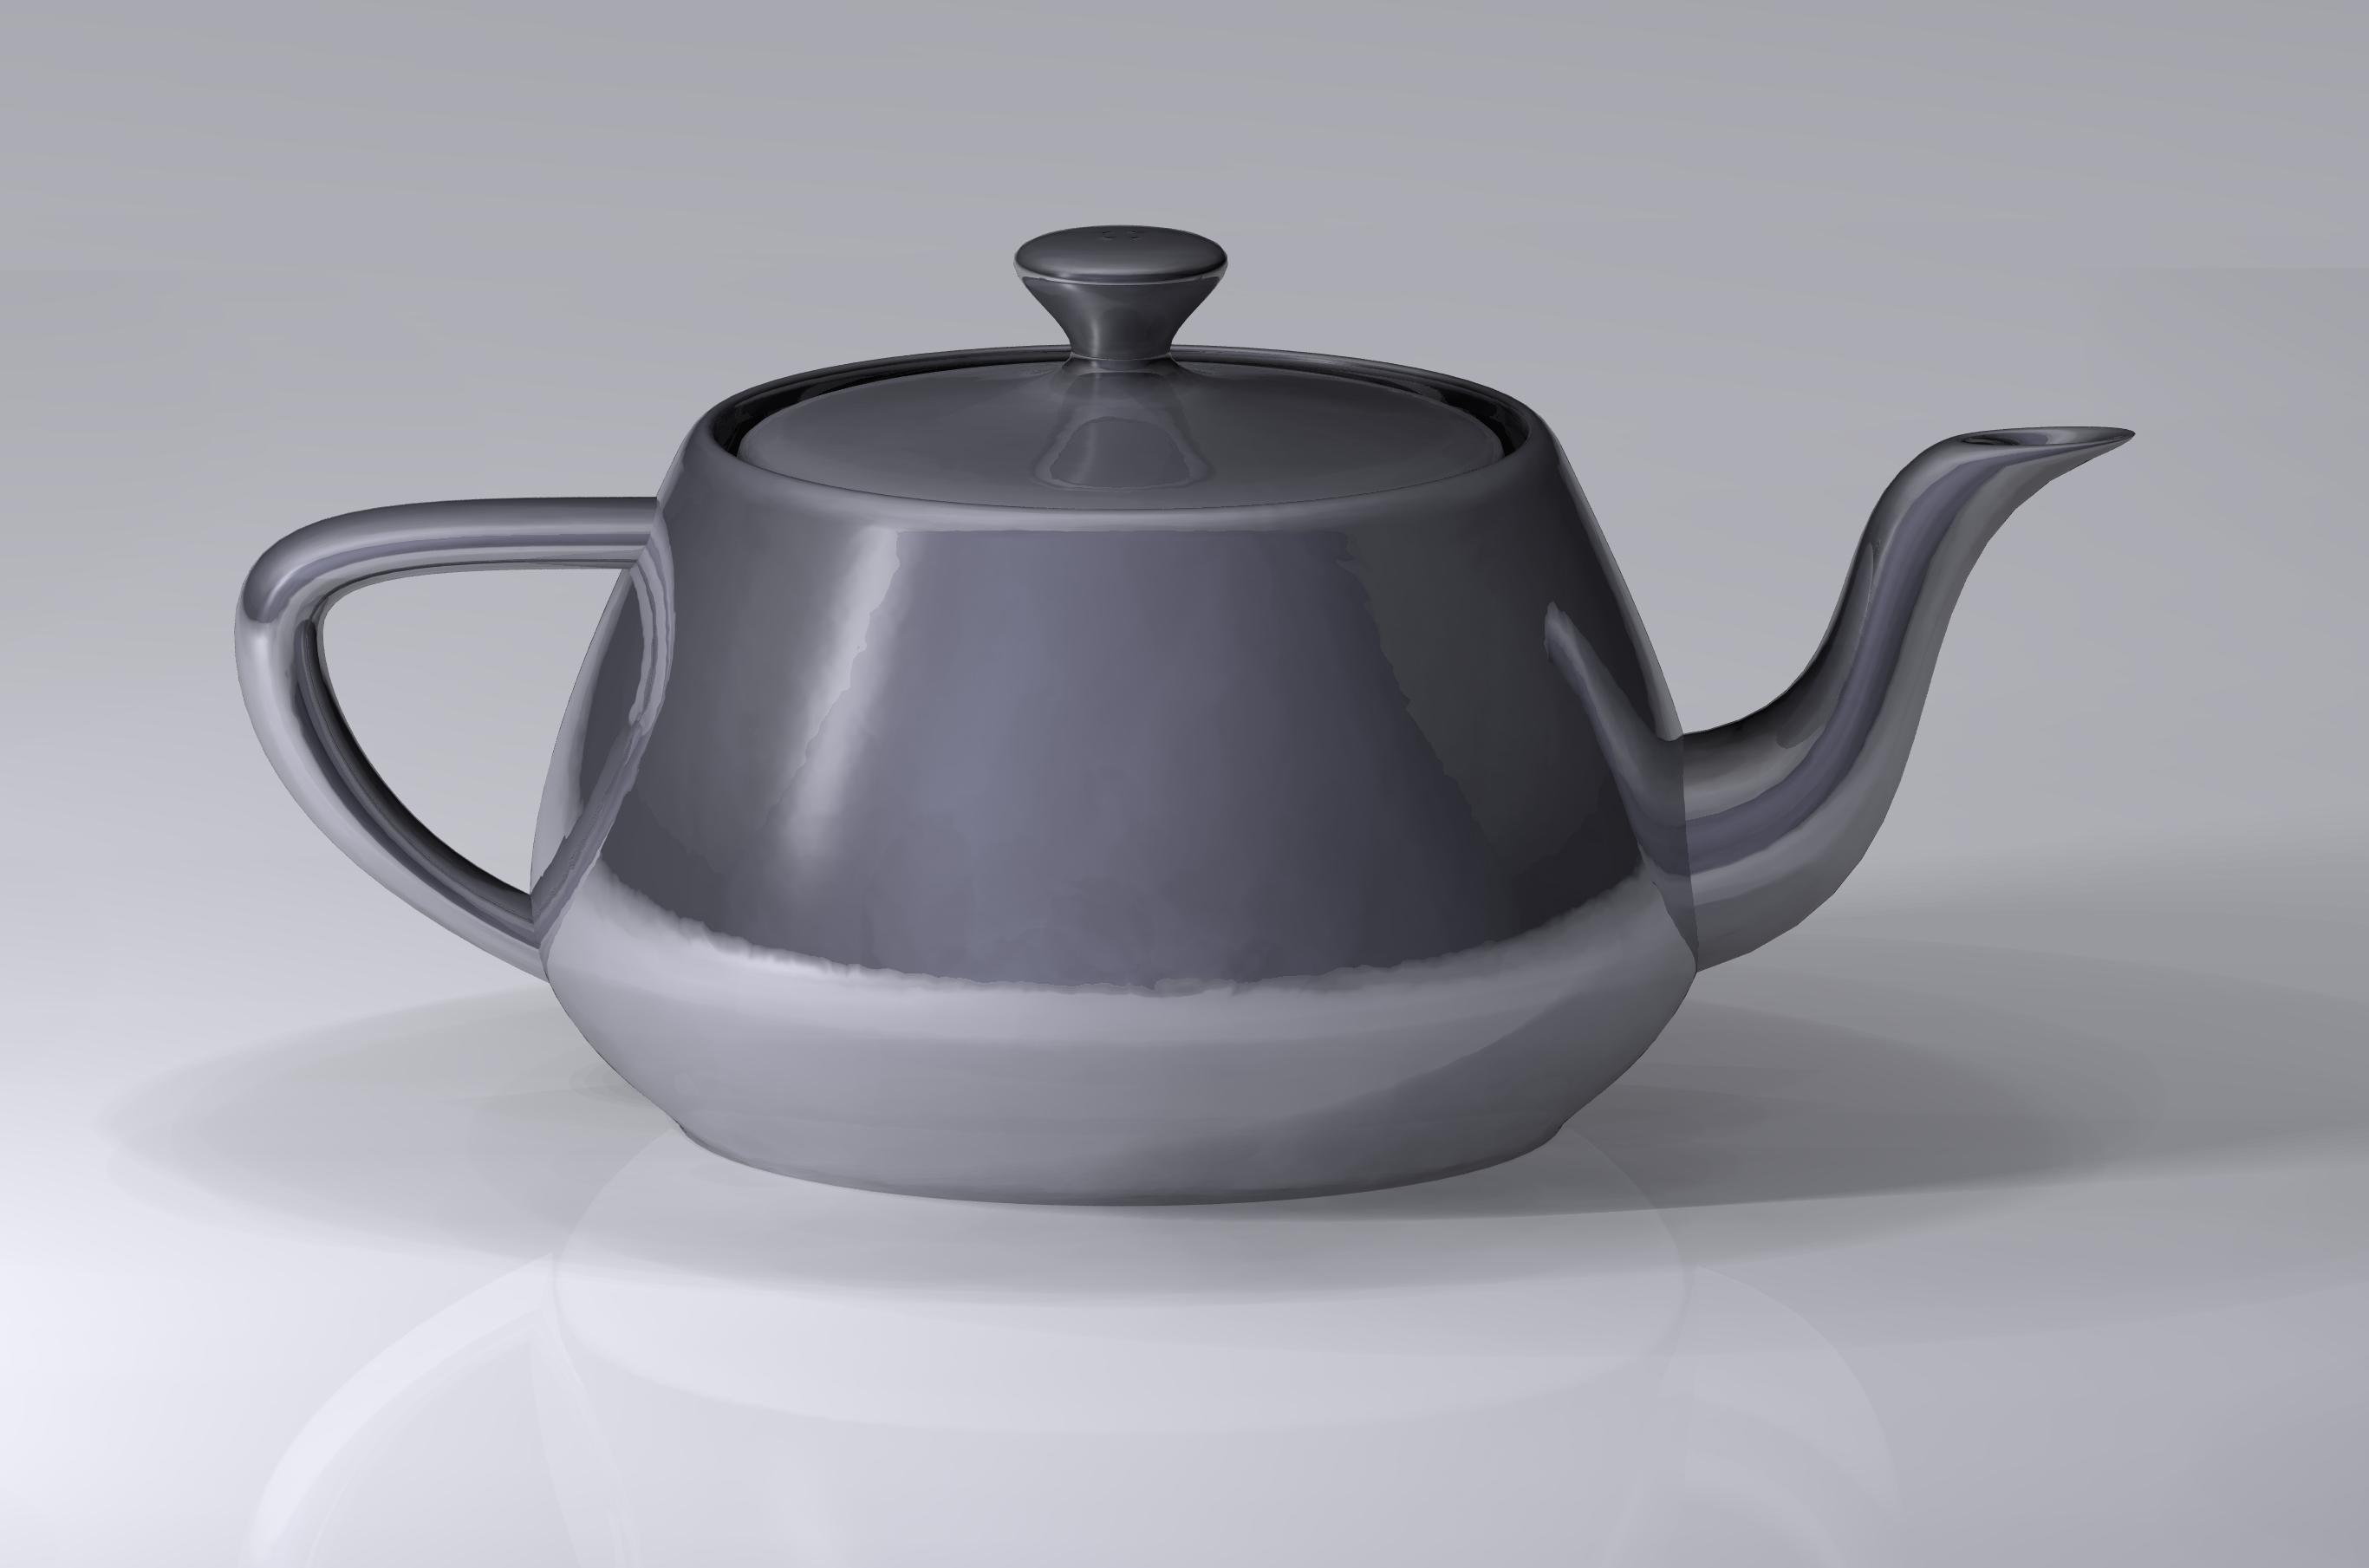 A modern rendering of the Utah teapot model.